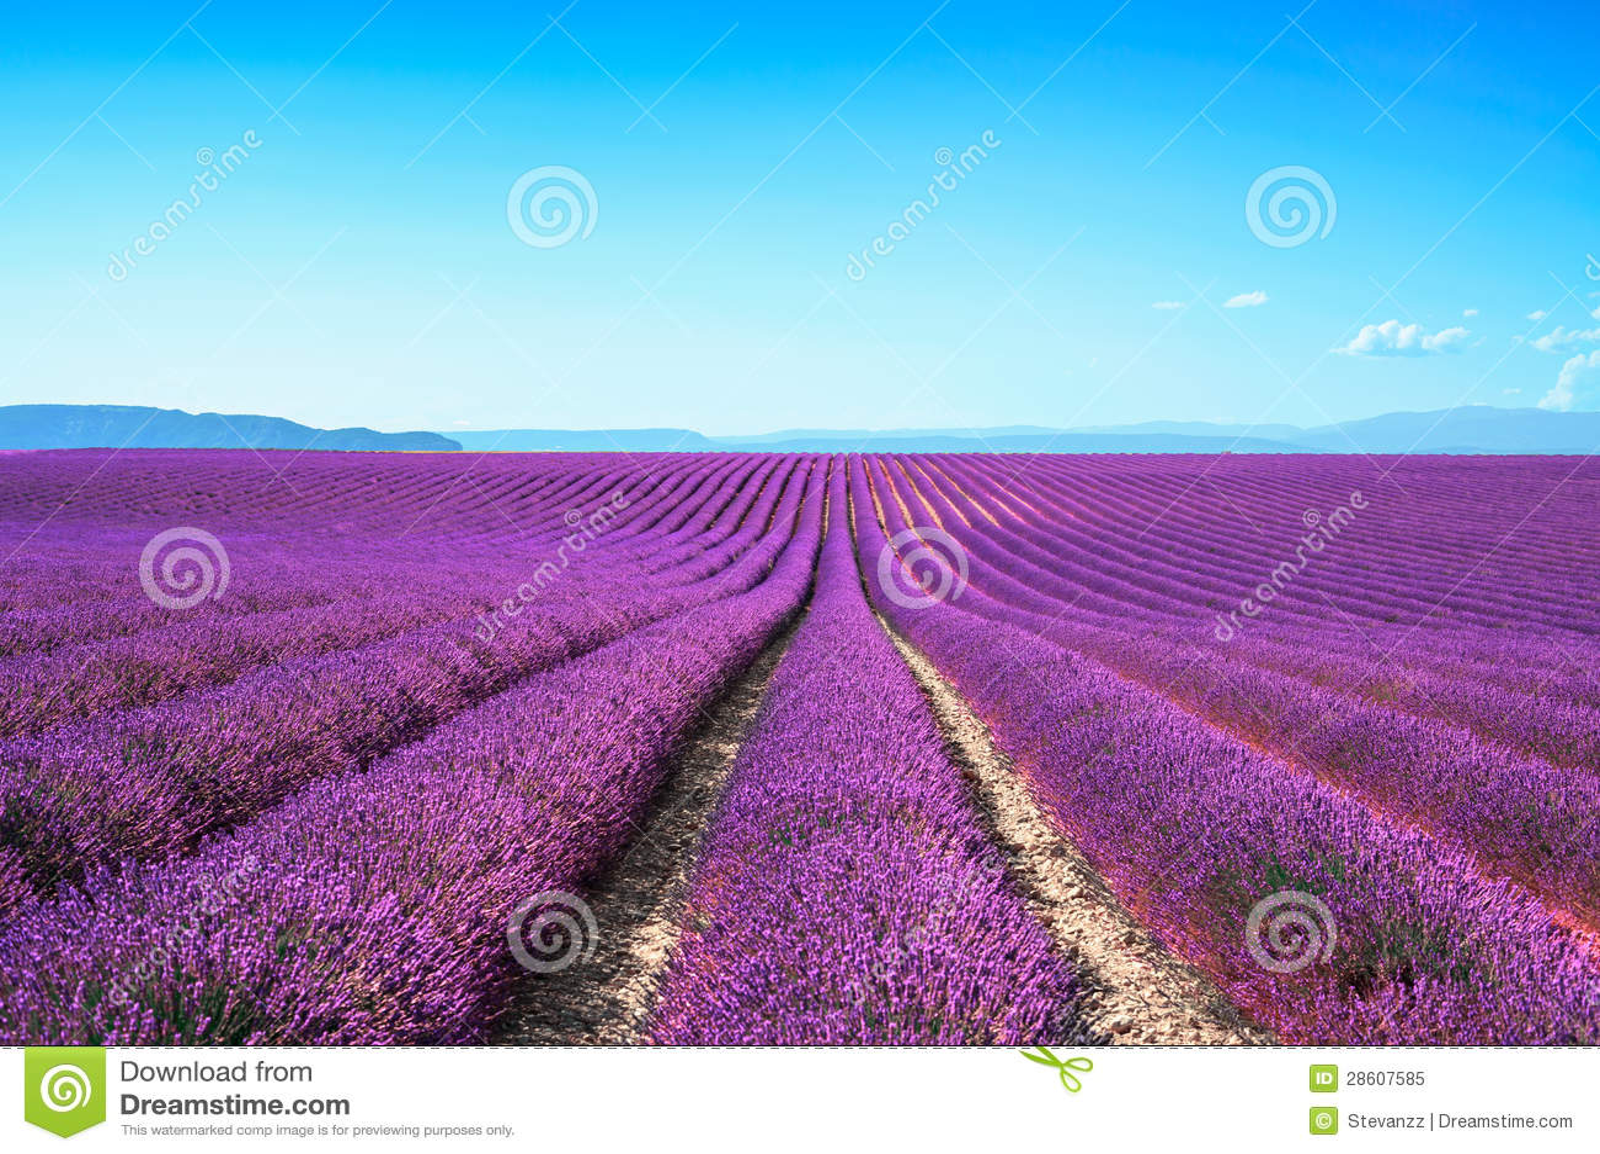 Рядки полей цветка лаванды зацветая бесконечные. Valensole Провансаль